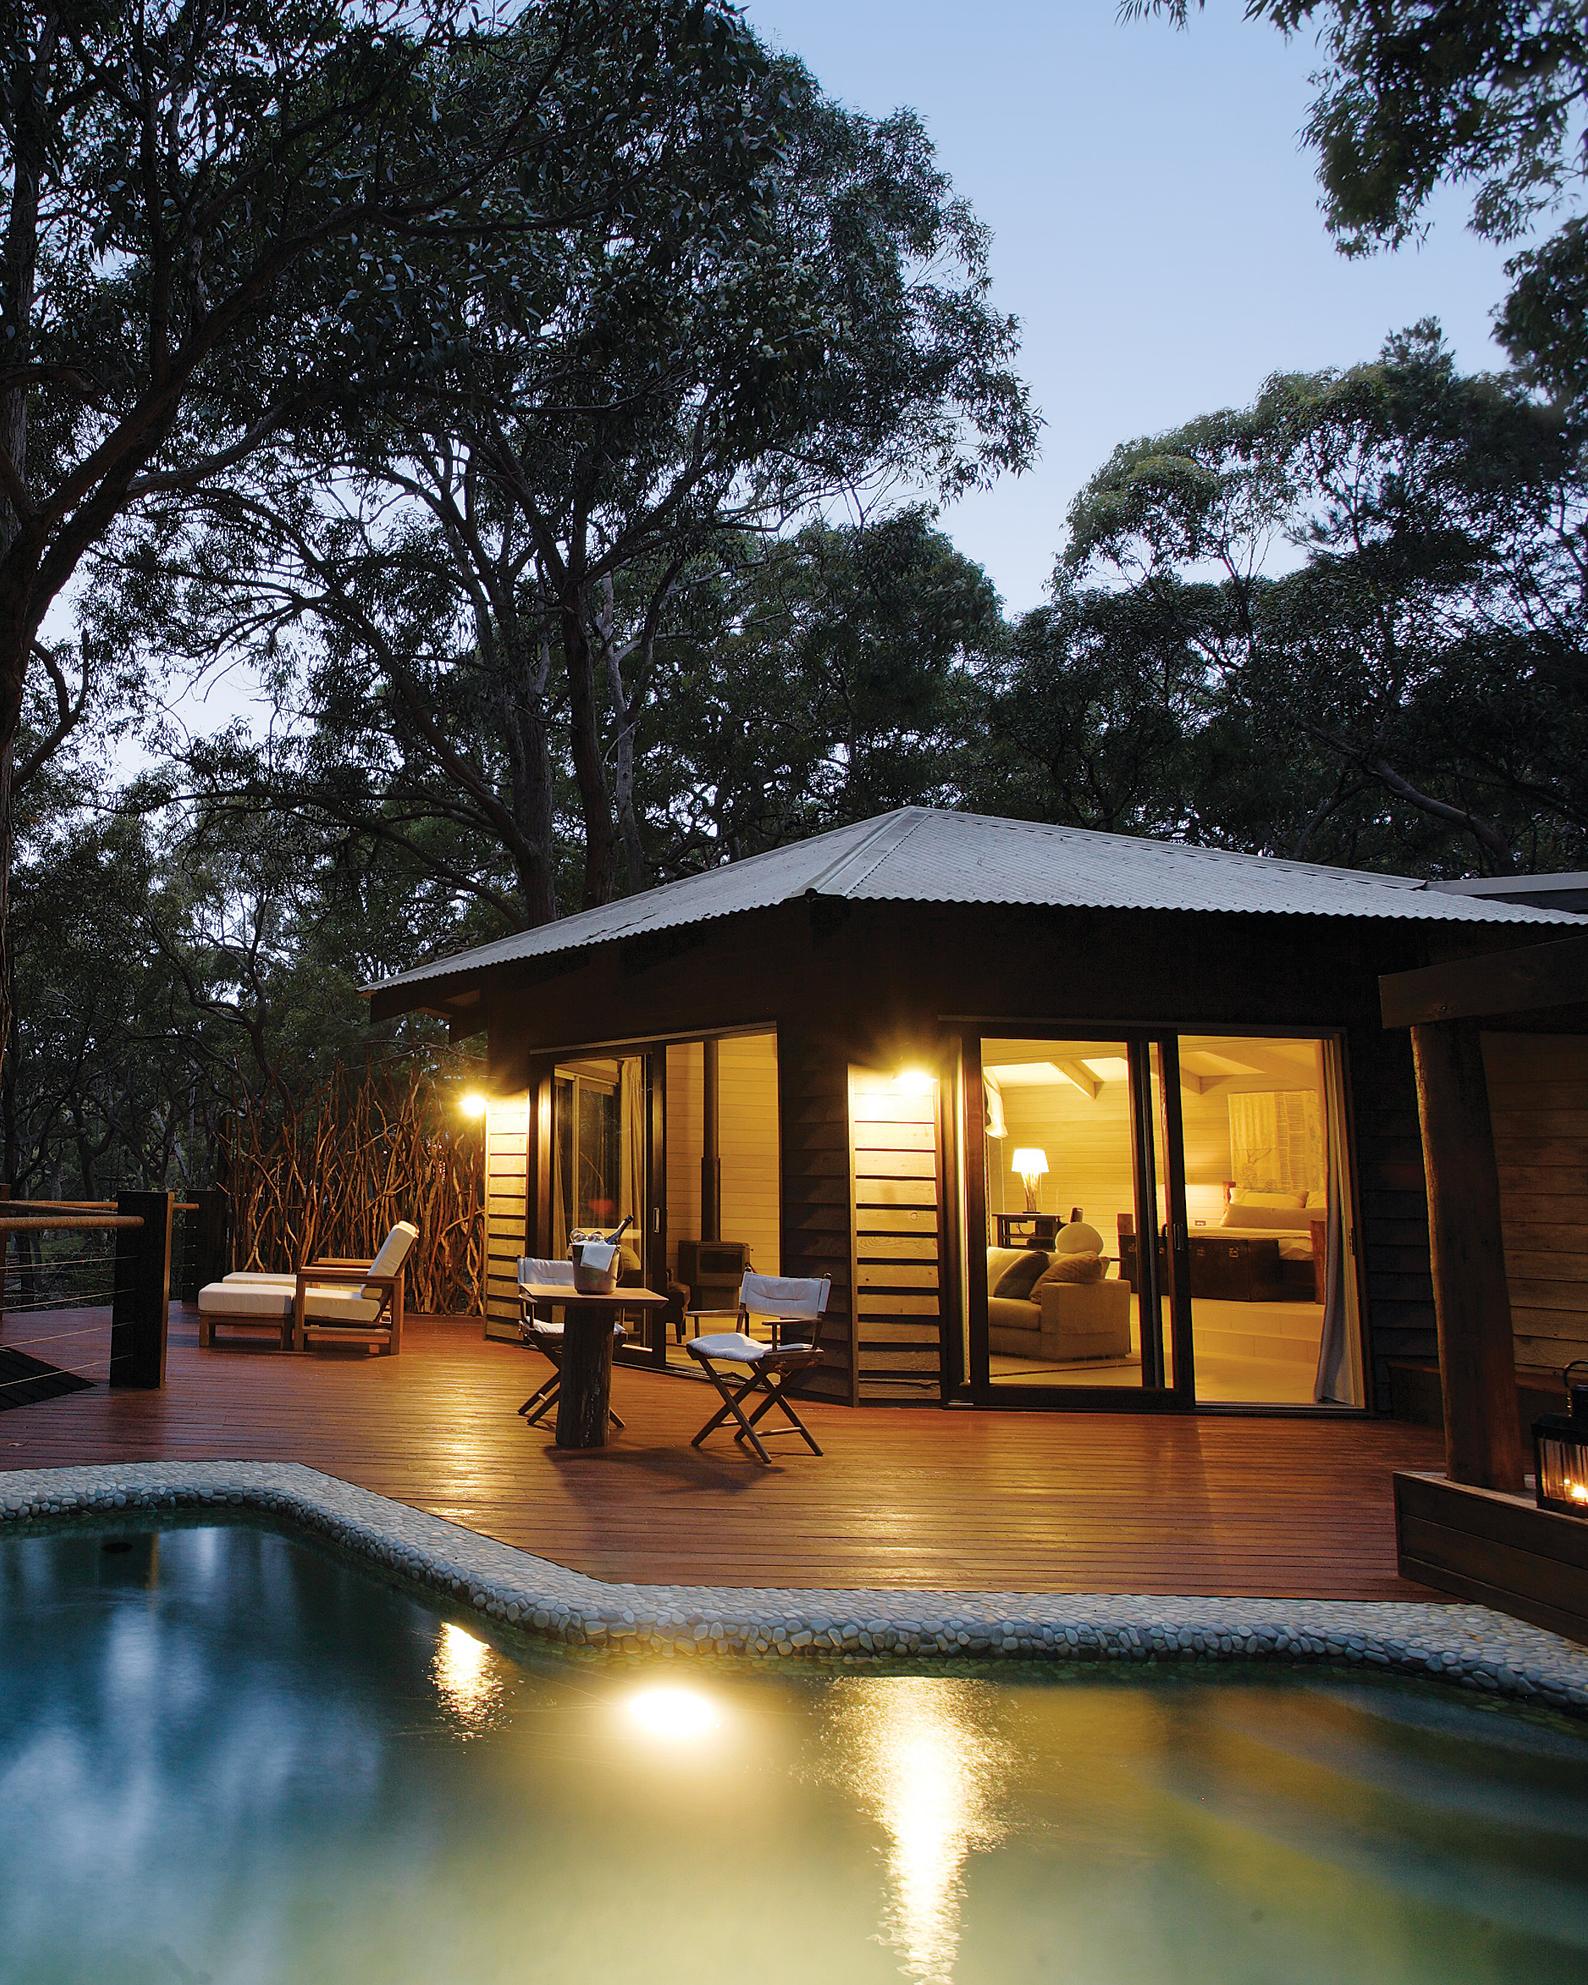 beach-house-australia-mwd1011mmsmith.jpg